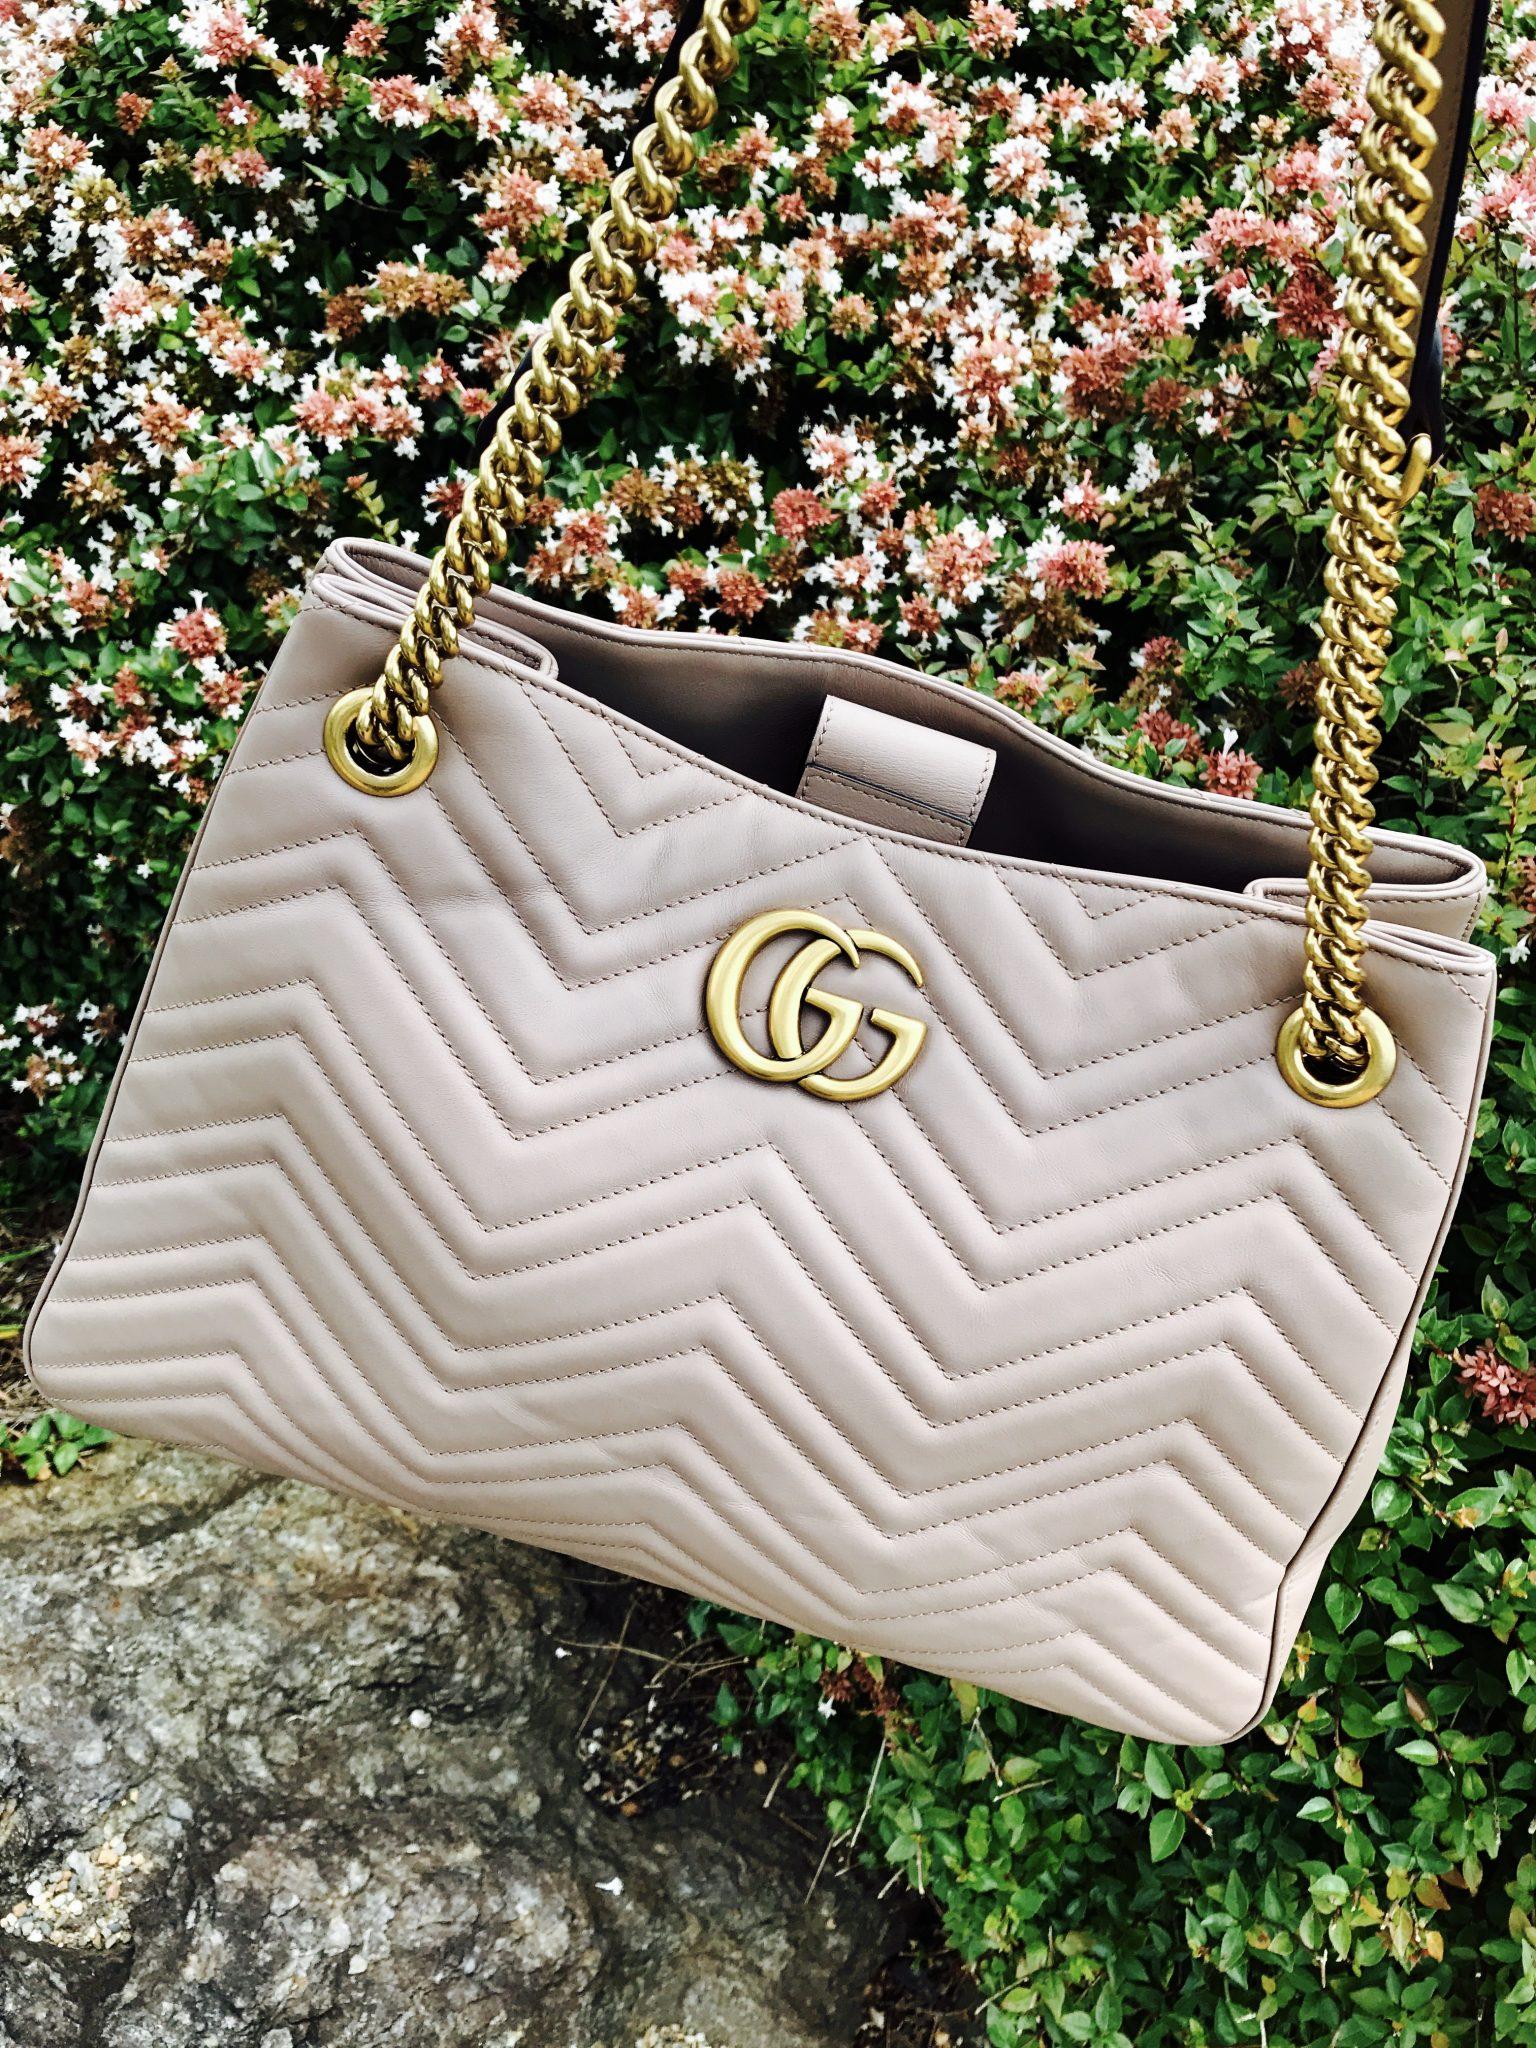 What's In My Bag: GG Marmont Matelassé Shoulder Bag